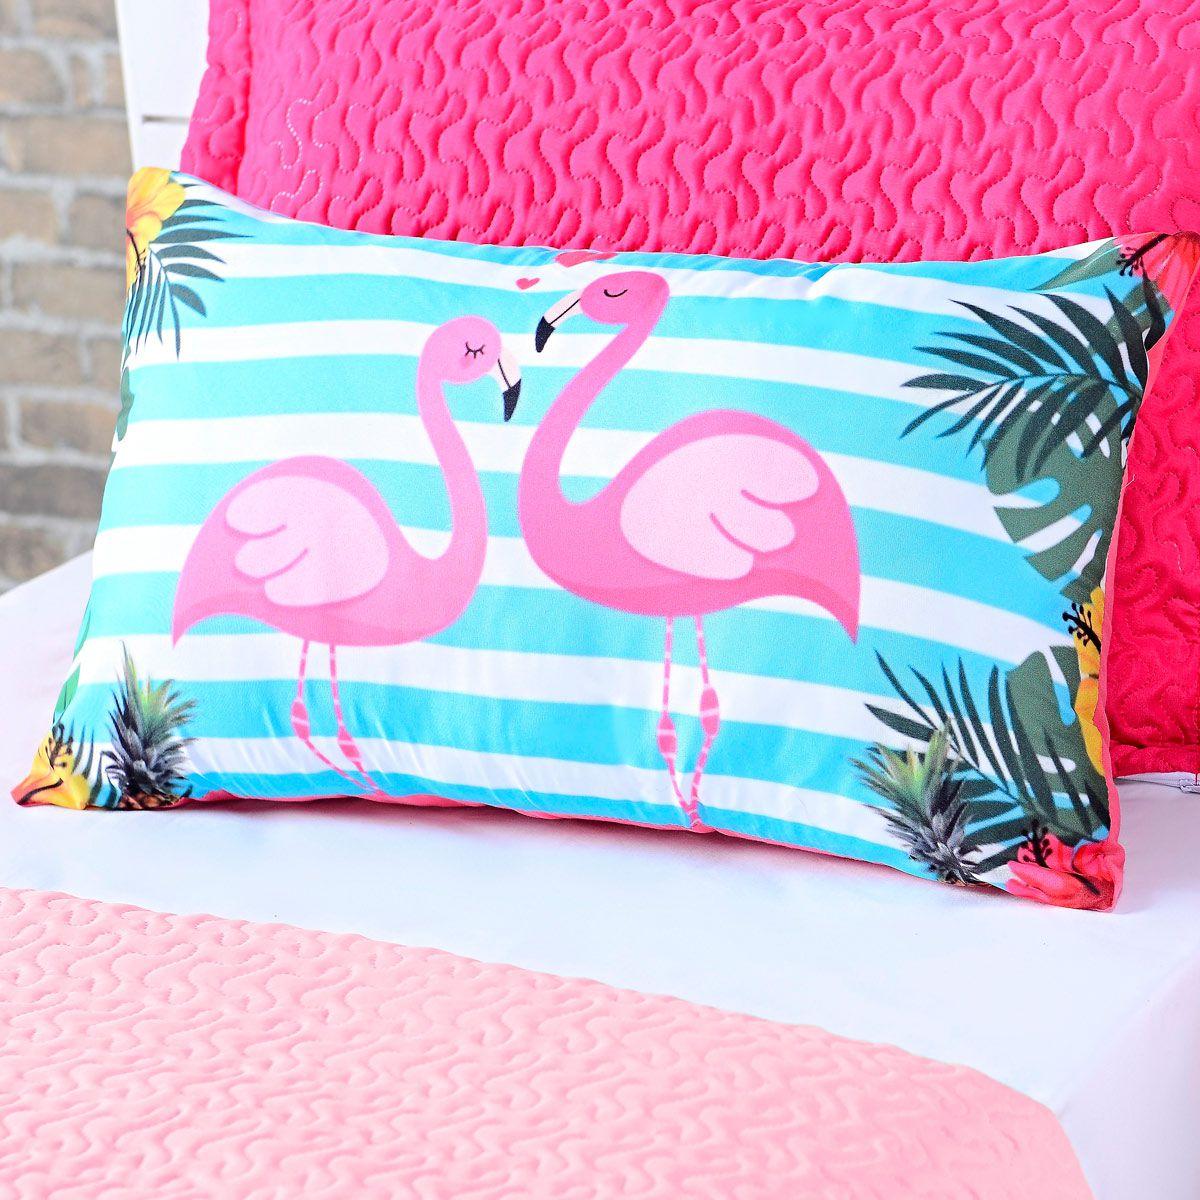 Almofada Avulsa Flamingo Rosa/Azul 60cm x 40cm c/ Refil